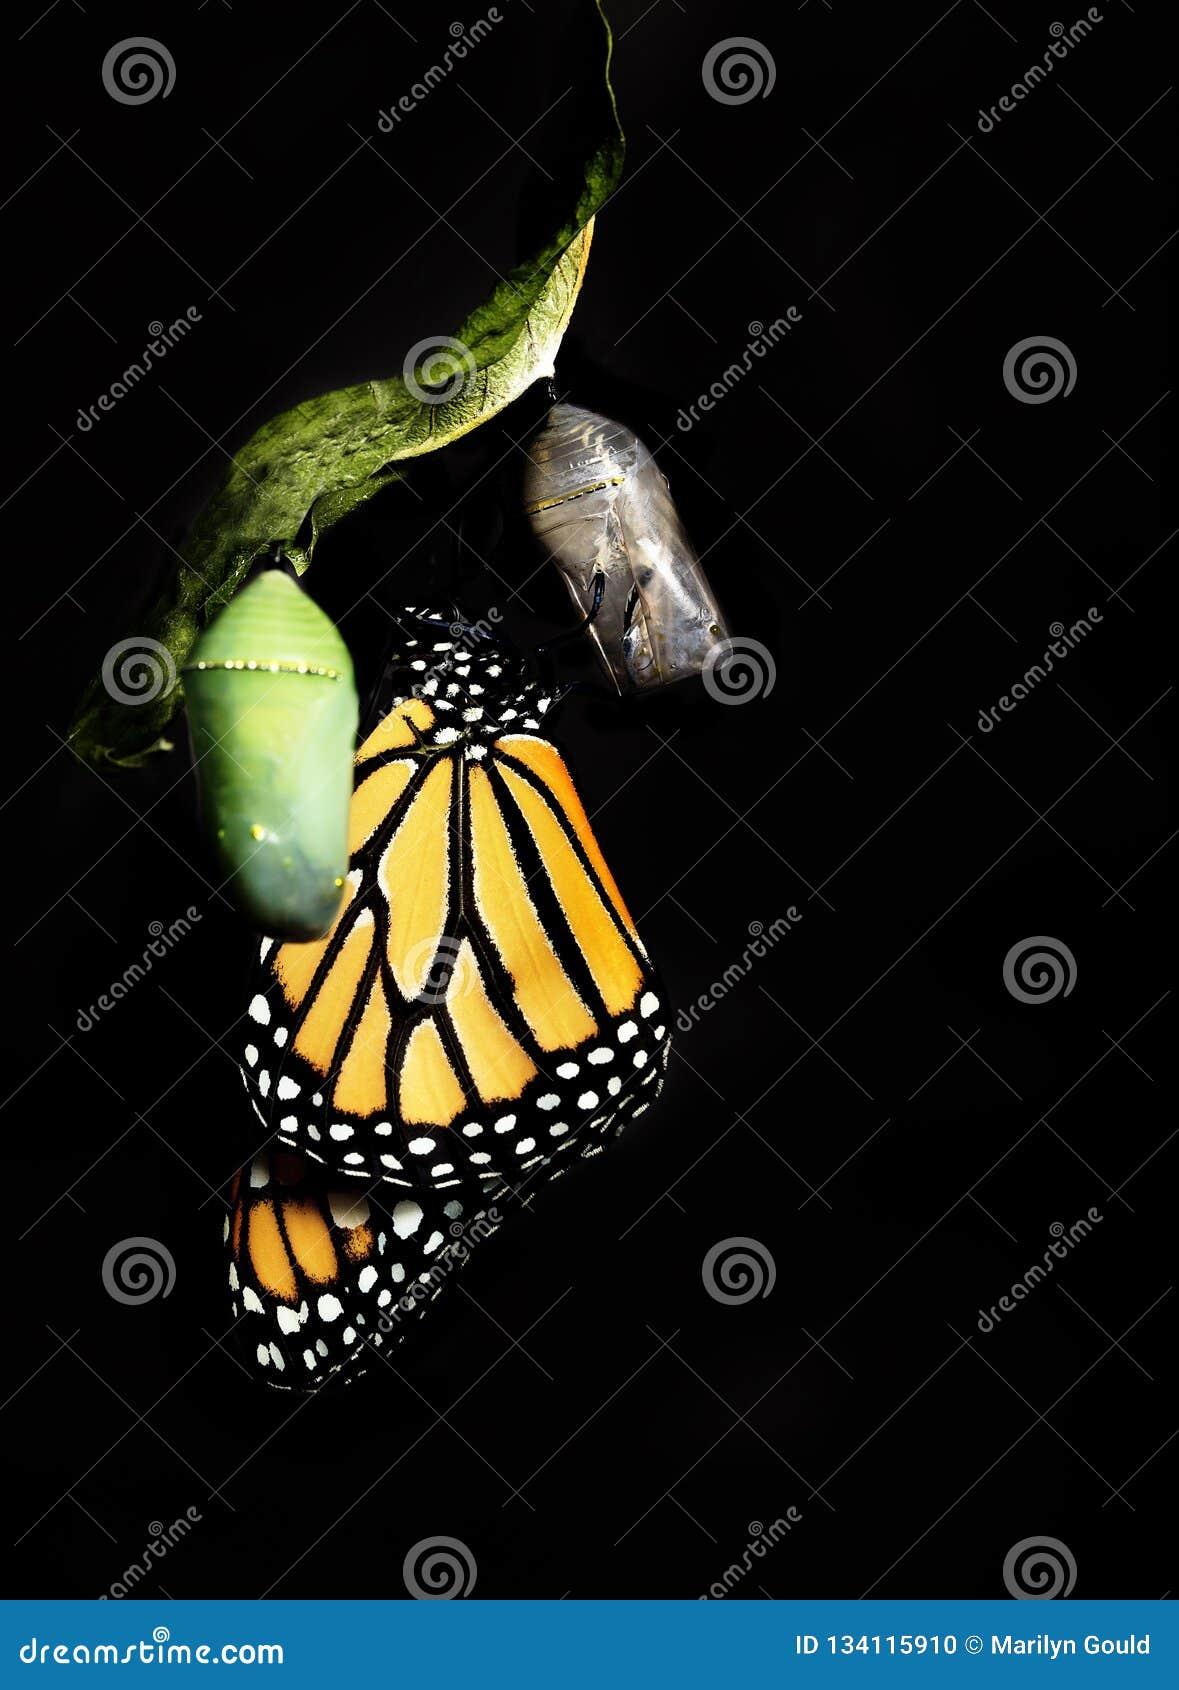 Borboleta de monarca que adere-se para esvaziar a crisálida